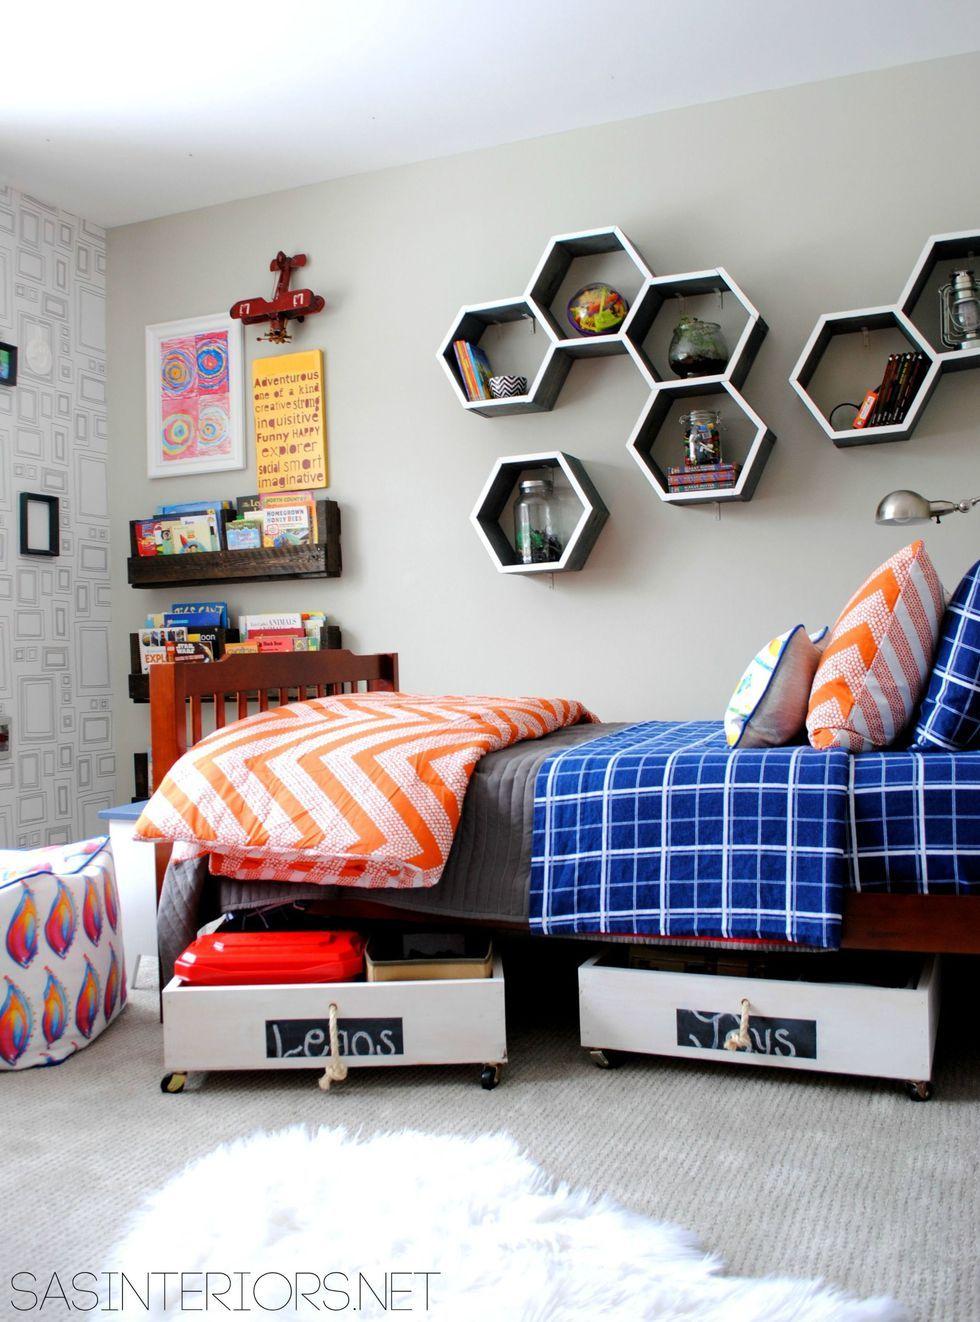 11 Clever Book Storage Ideas For Kids Mommyhooding Kids Room Organization Diy Kids Book Storage Kids Storage